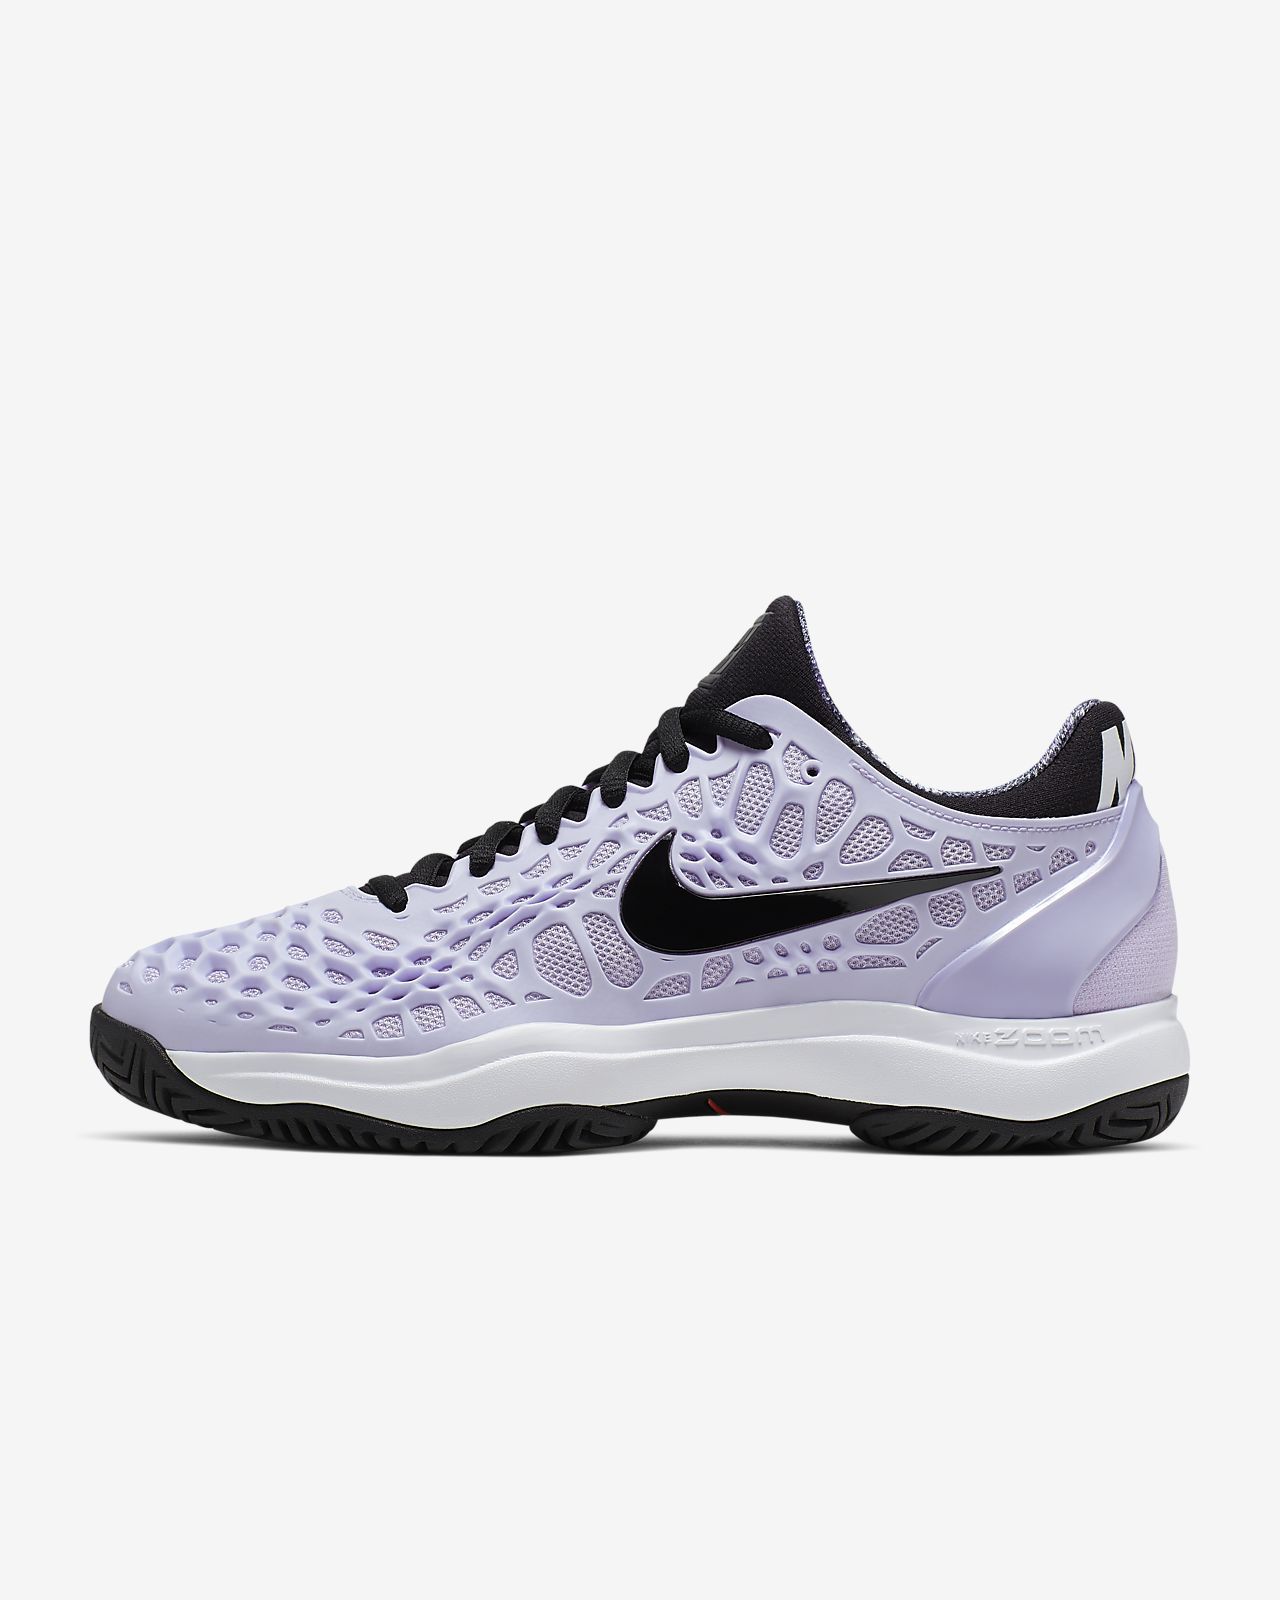 NikeCourt Zoom Cage 3 女款硬地球場網球鞋